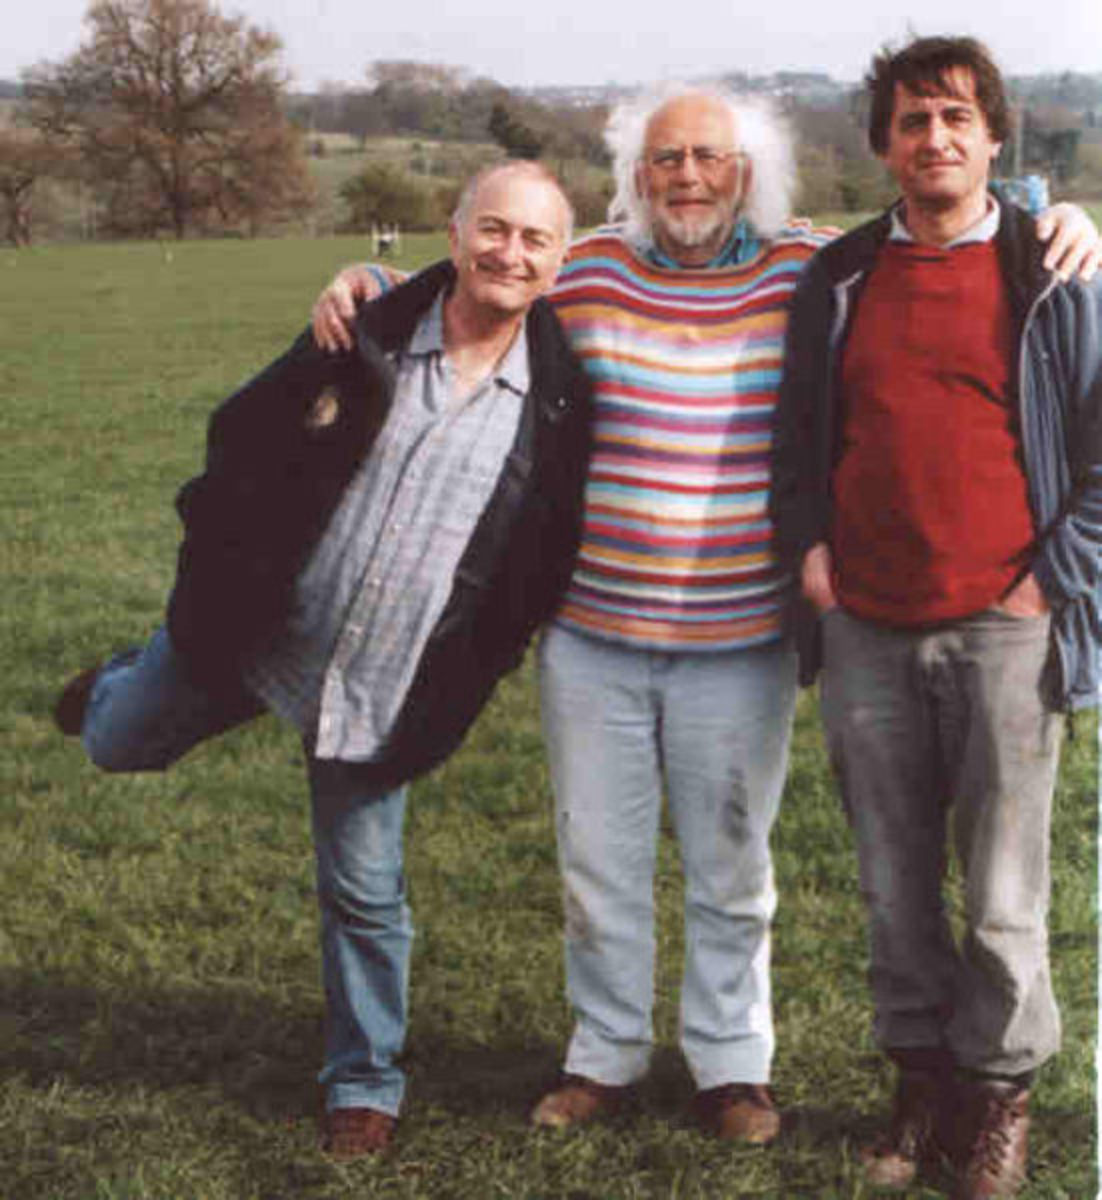 Time Team, 2007. Tony Robinson, Mick Aston , Guy de la Bedoyere on a Time Team dig.